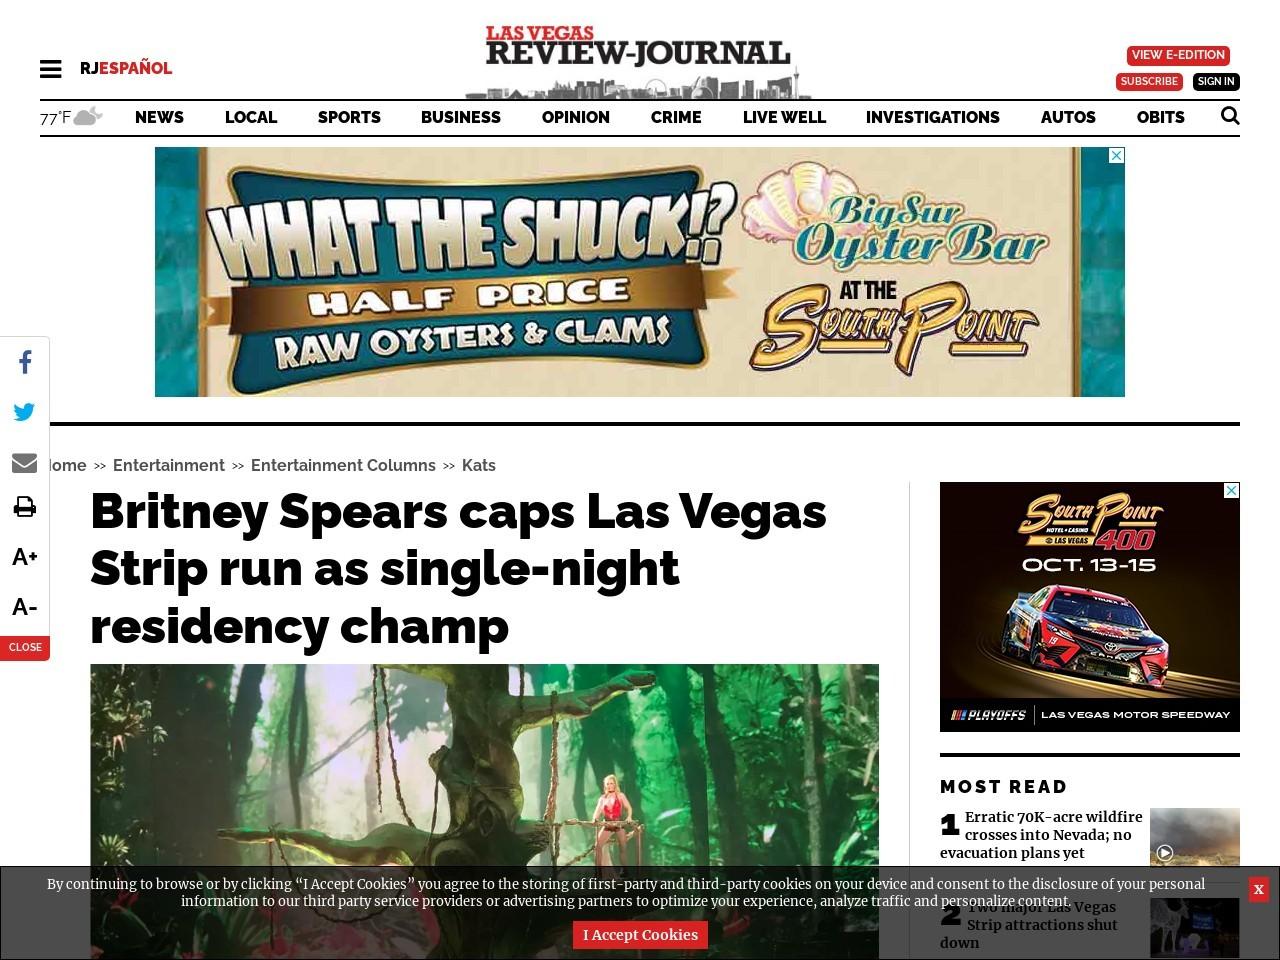 Britney Spears caps Las Vegas Strip run as single-night residency champ